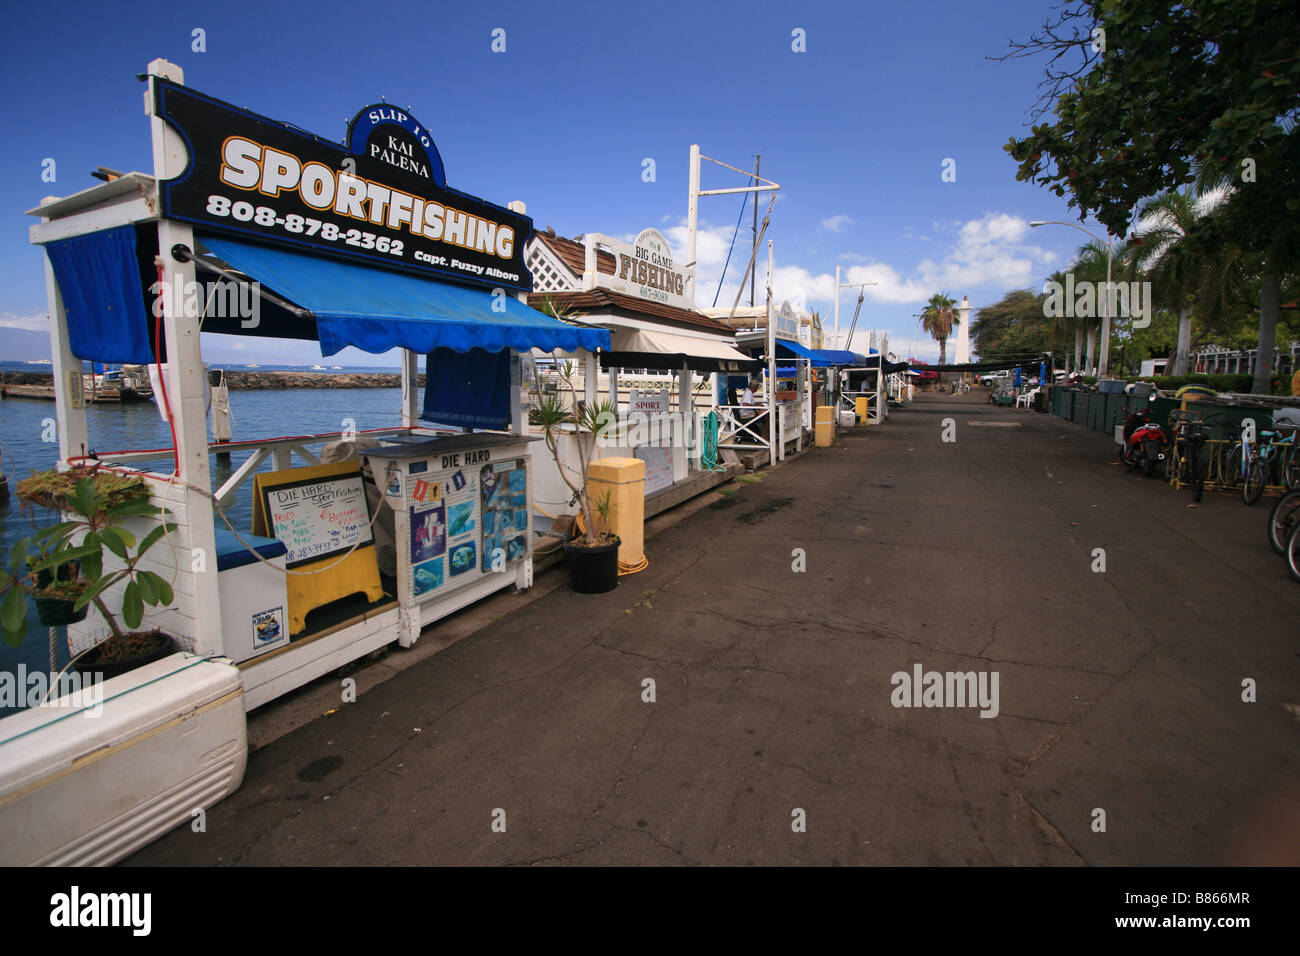 sportfishing marketplace along the water in Lahaina, Maui, Hawaii Stock Photo